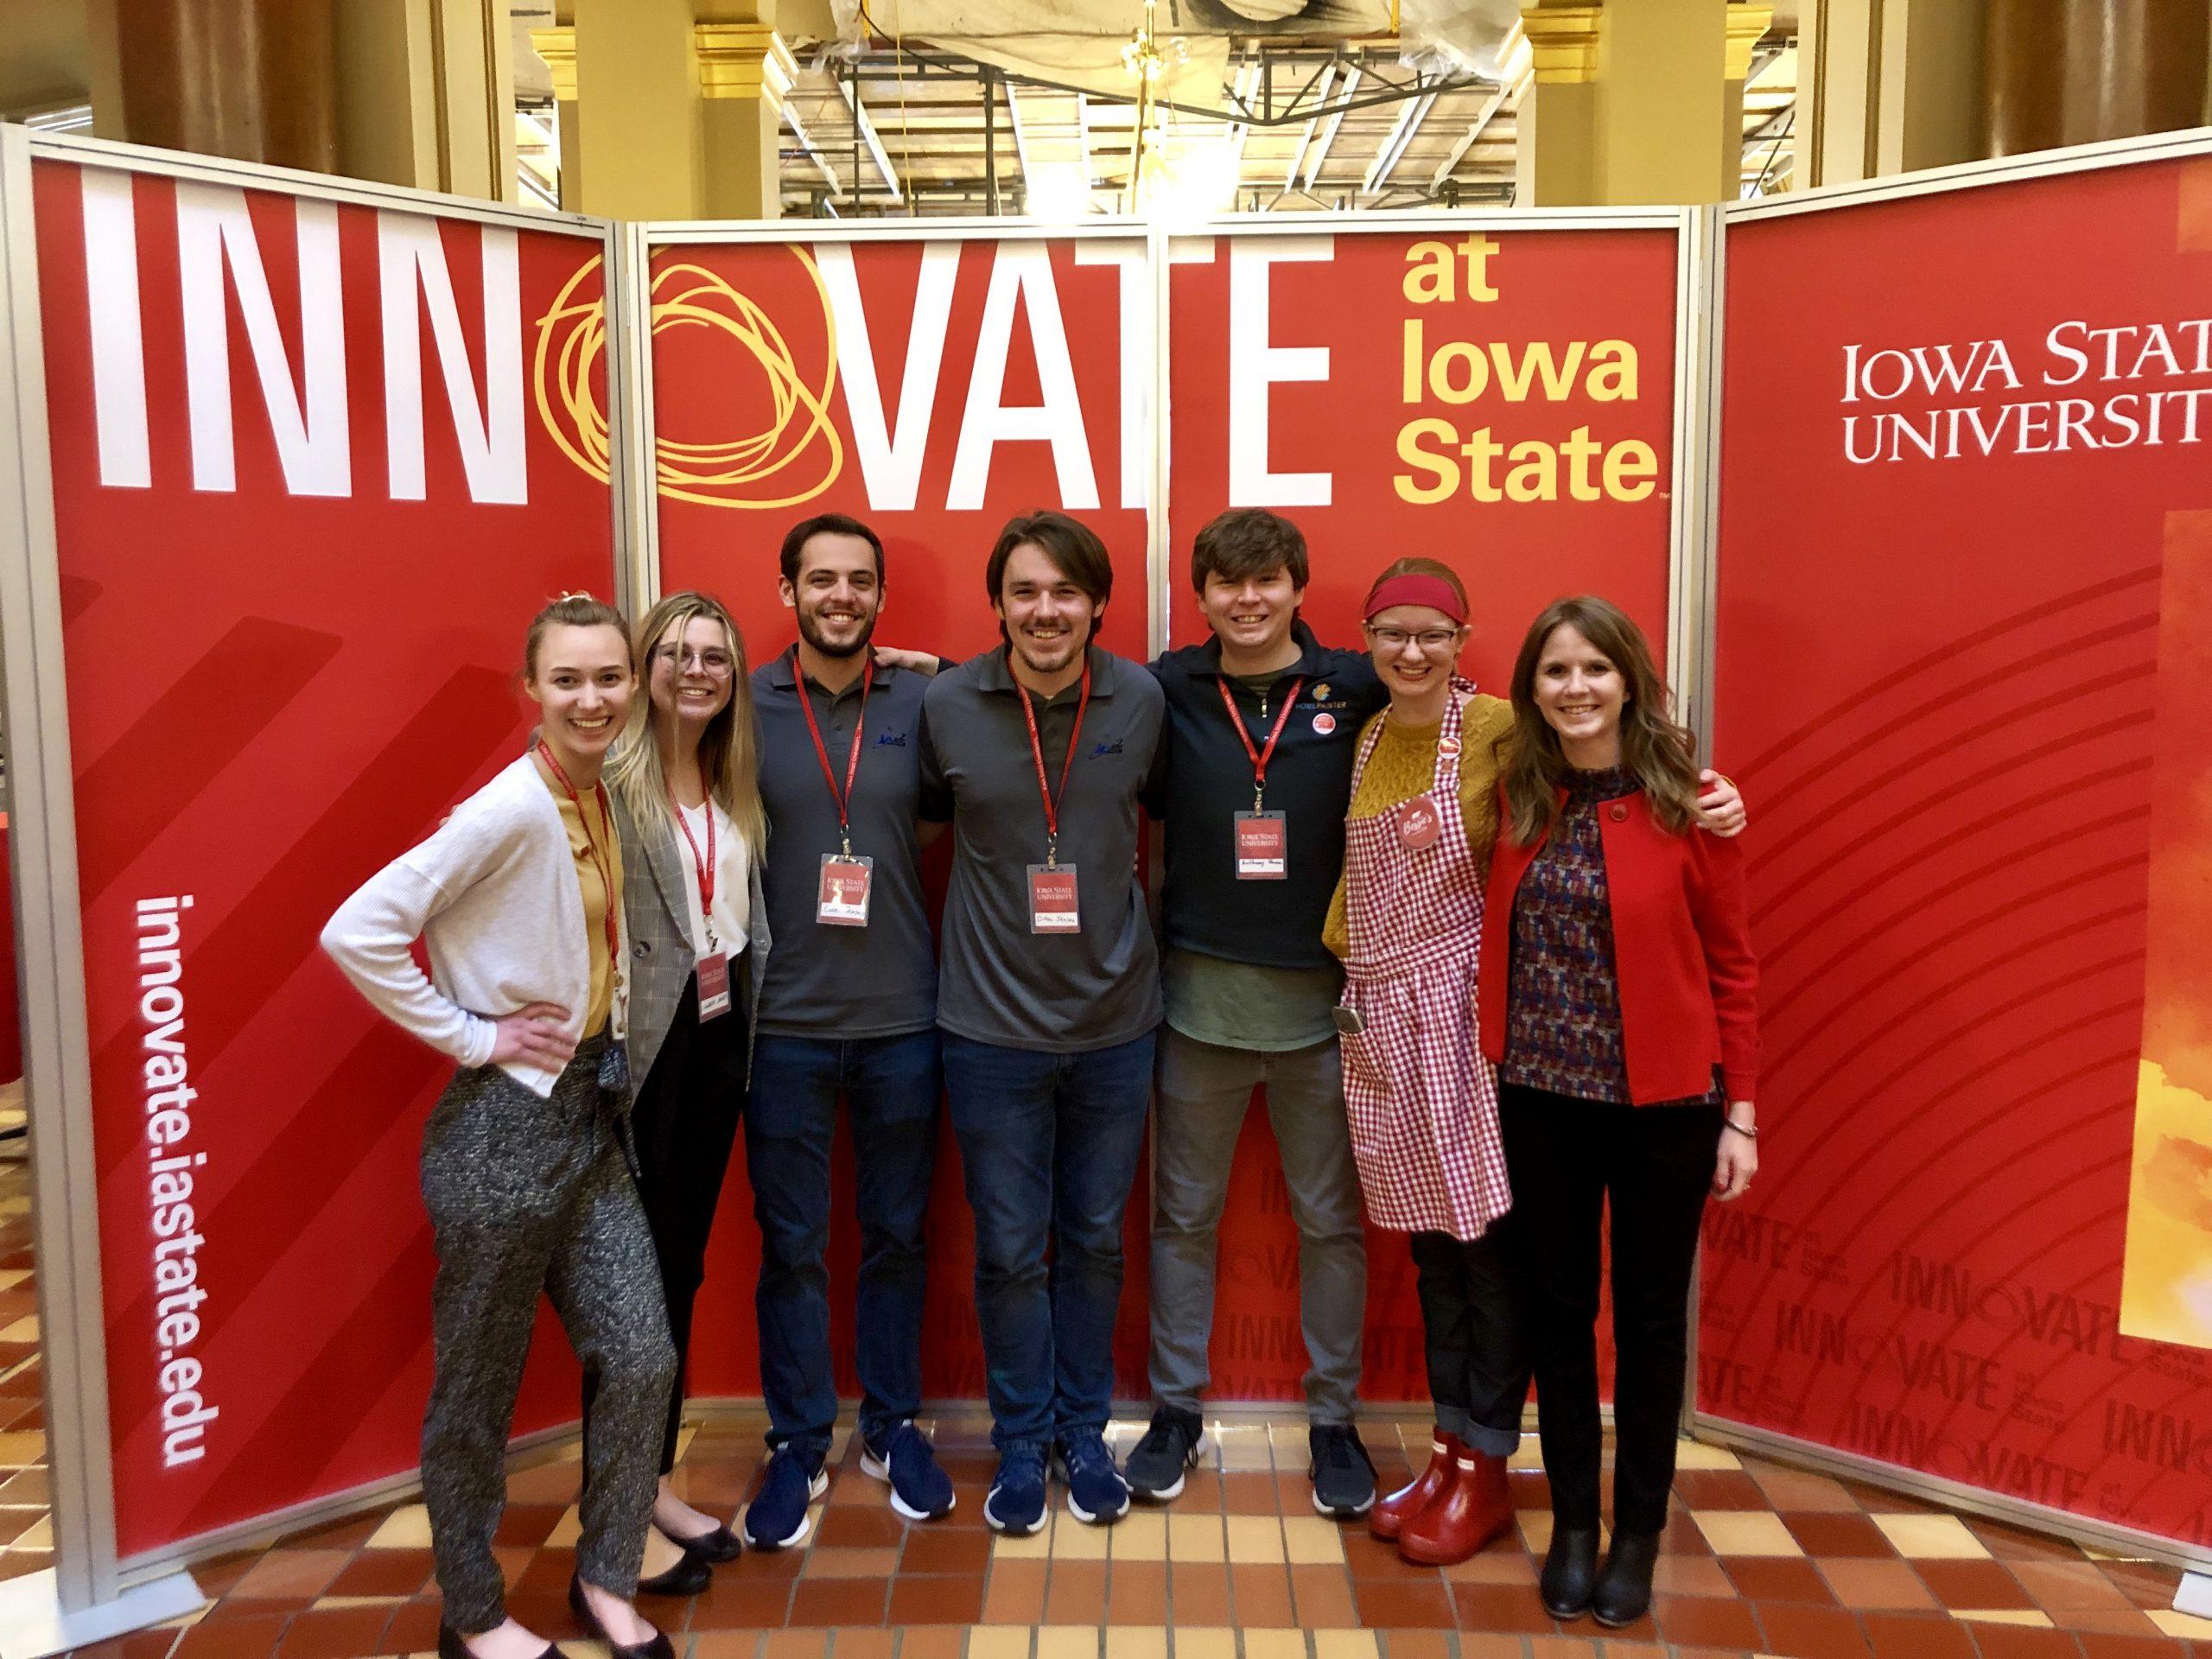 Iowa State University students pose at the Iowa state capitol